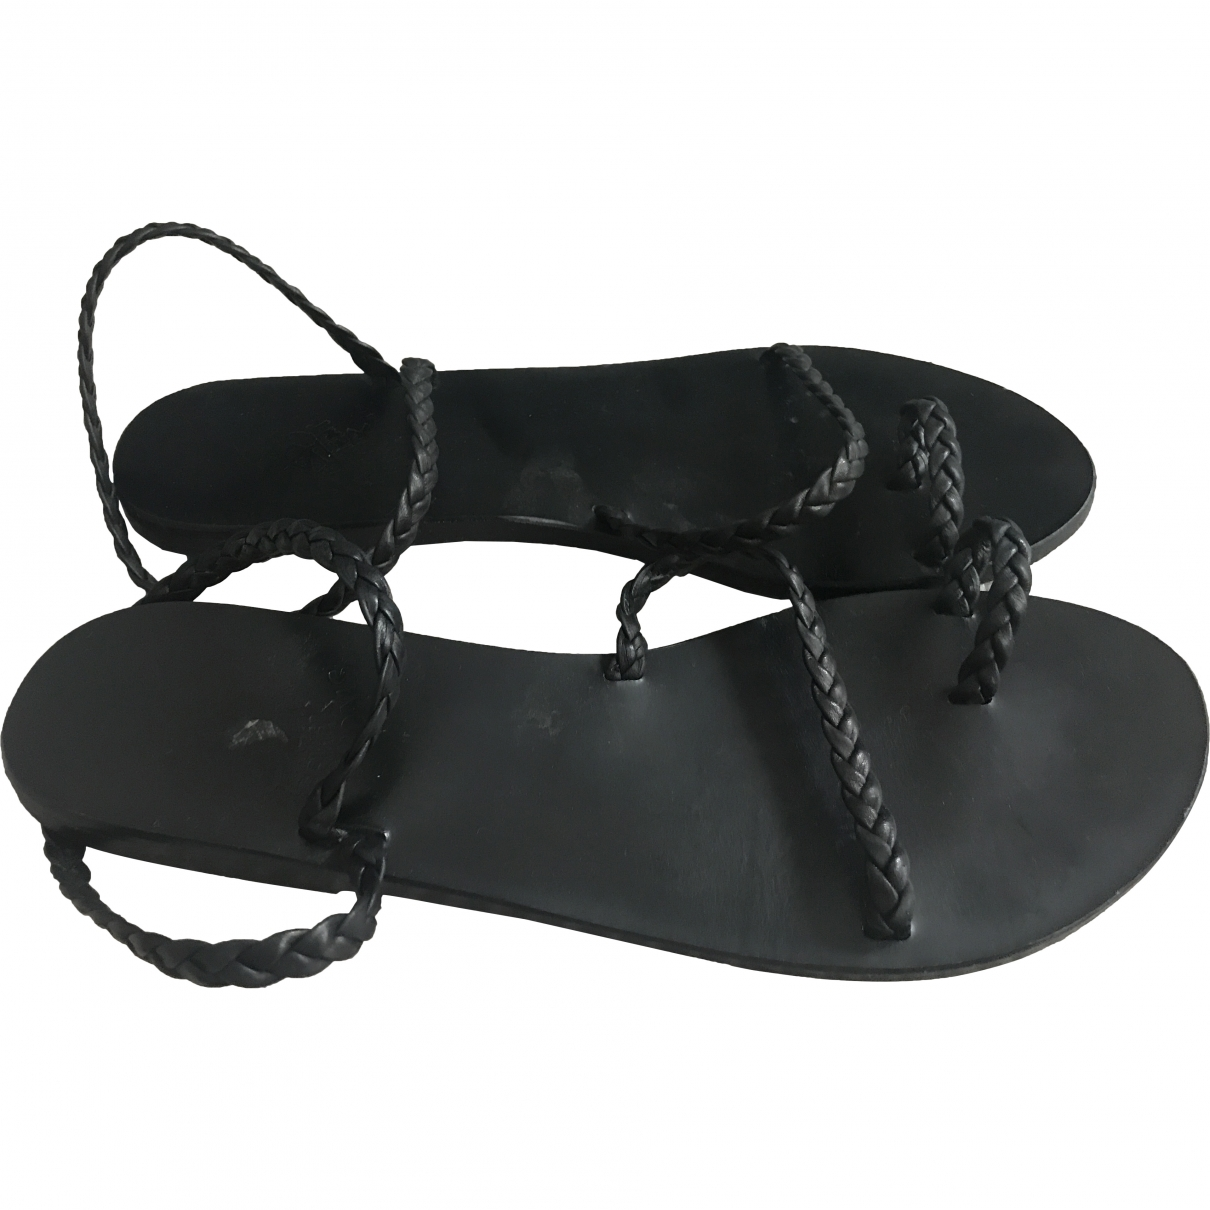 Ancient Greek Sandals \N Black Leather Sandals for Women 39 EU